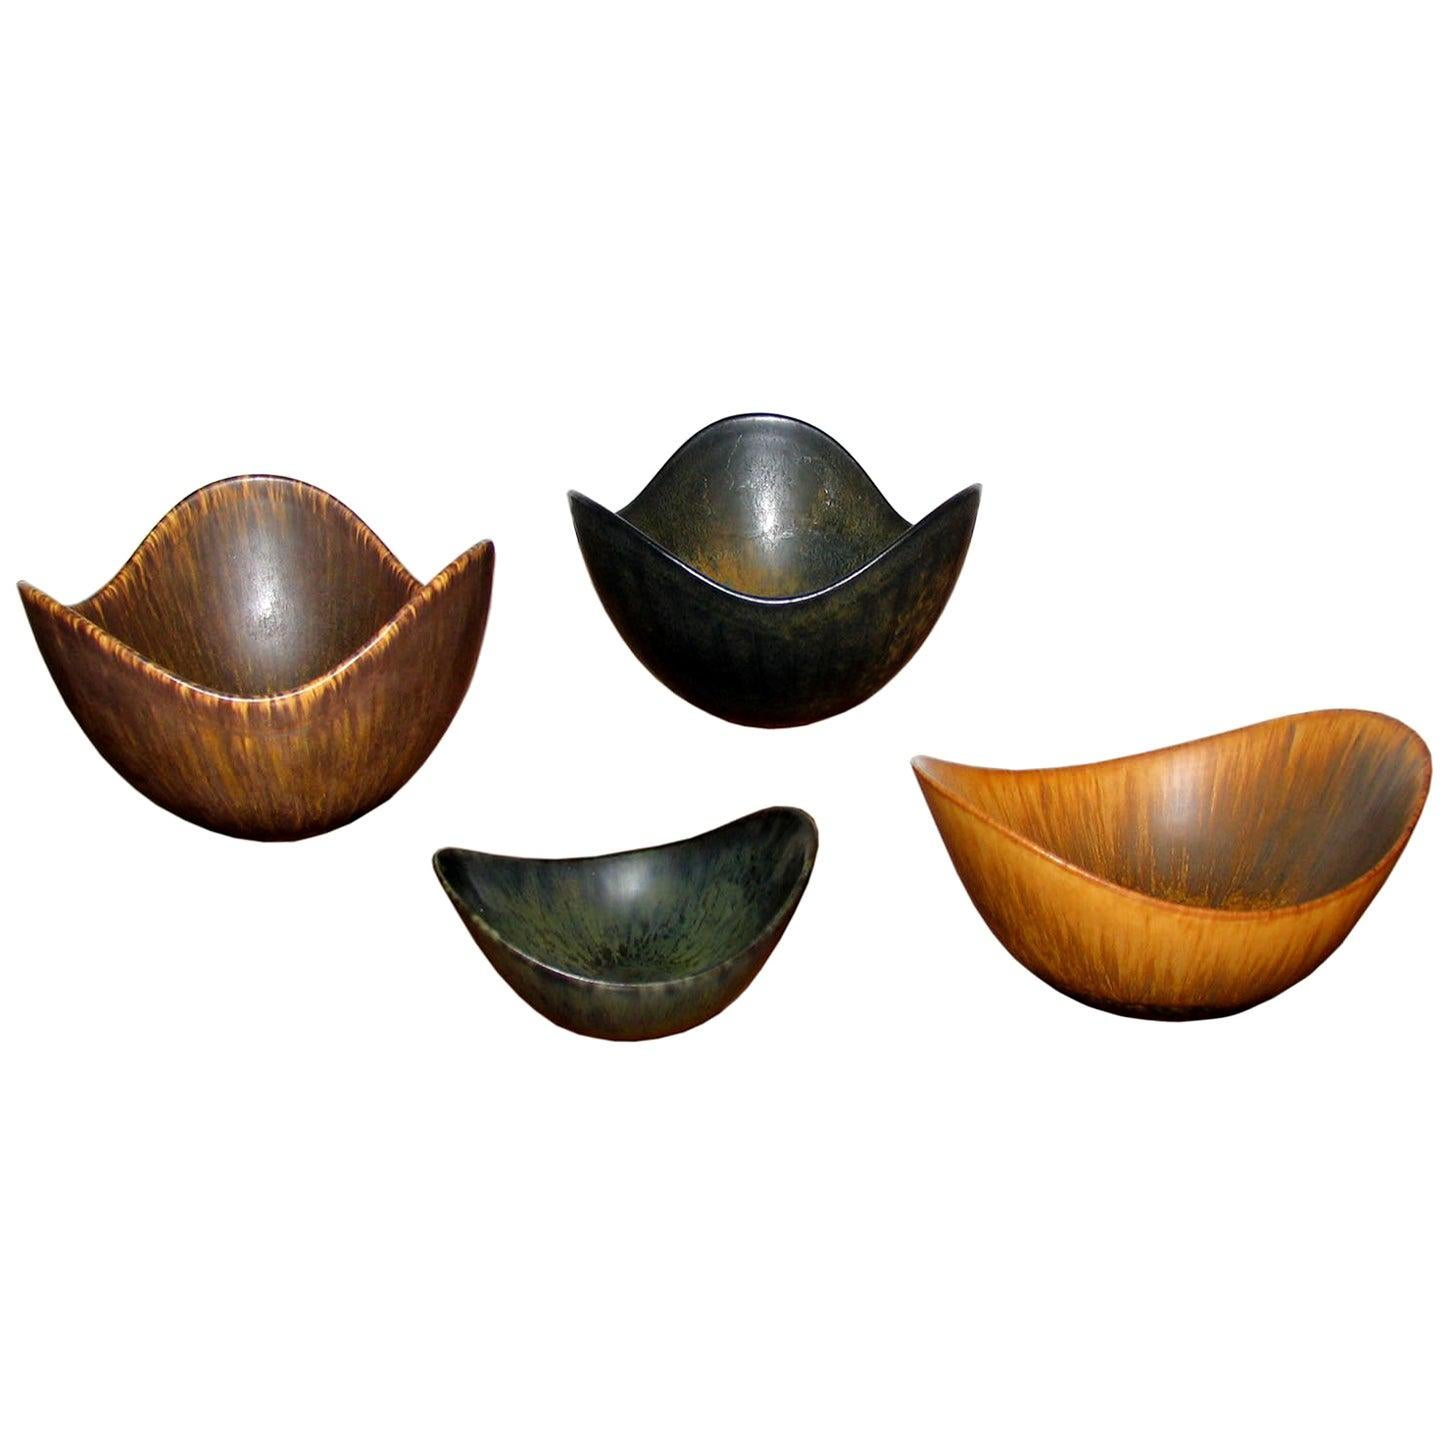 Mid-Century Modern Gunnar Nylund Ceramic Bowls Rörstrand, Sweden